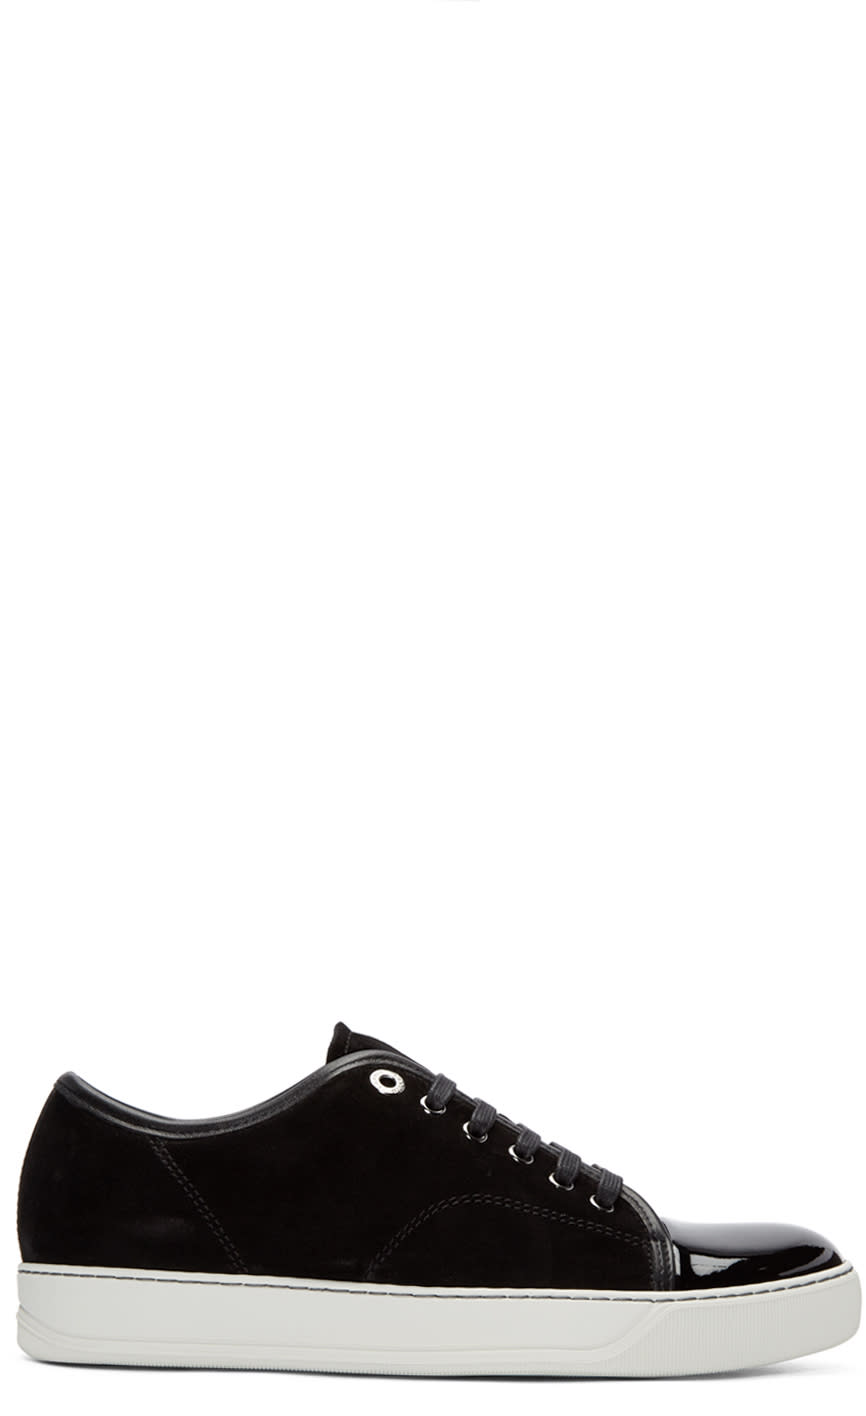 Lanvin Black Suede Tennis Sneakers